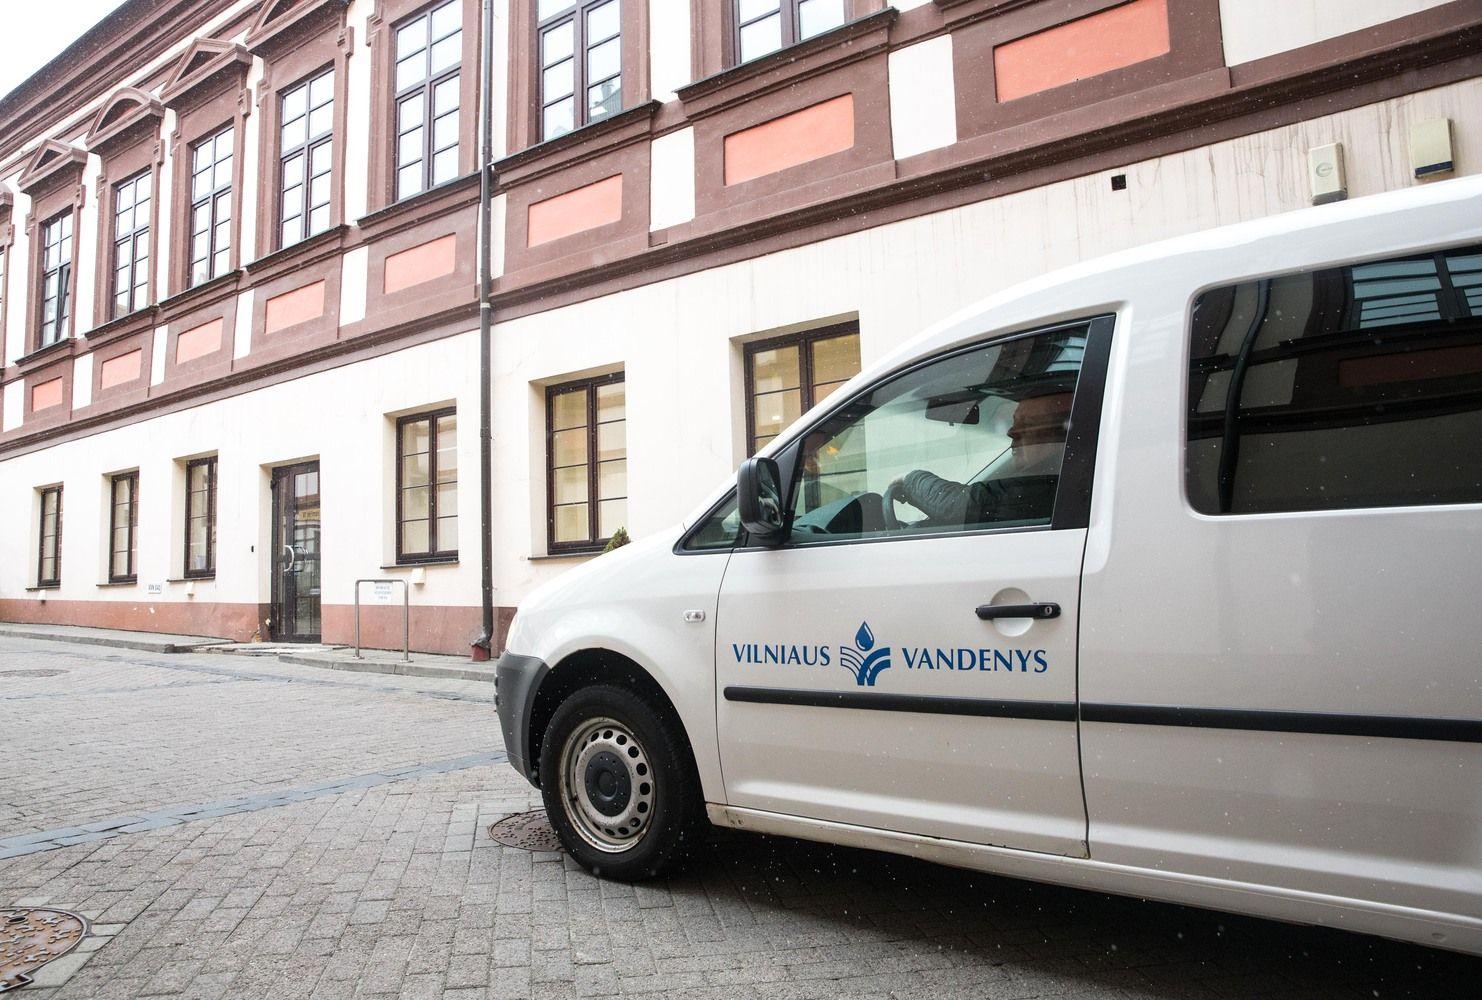 """Vilniaus vandenų"" finansams vadovauja Viktoras Baltuškonis"